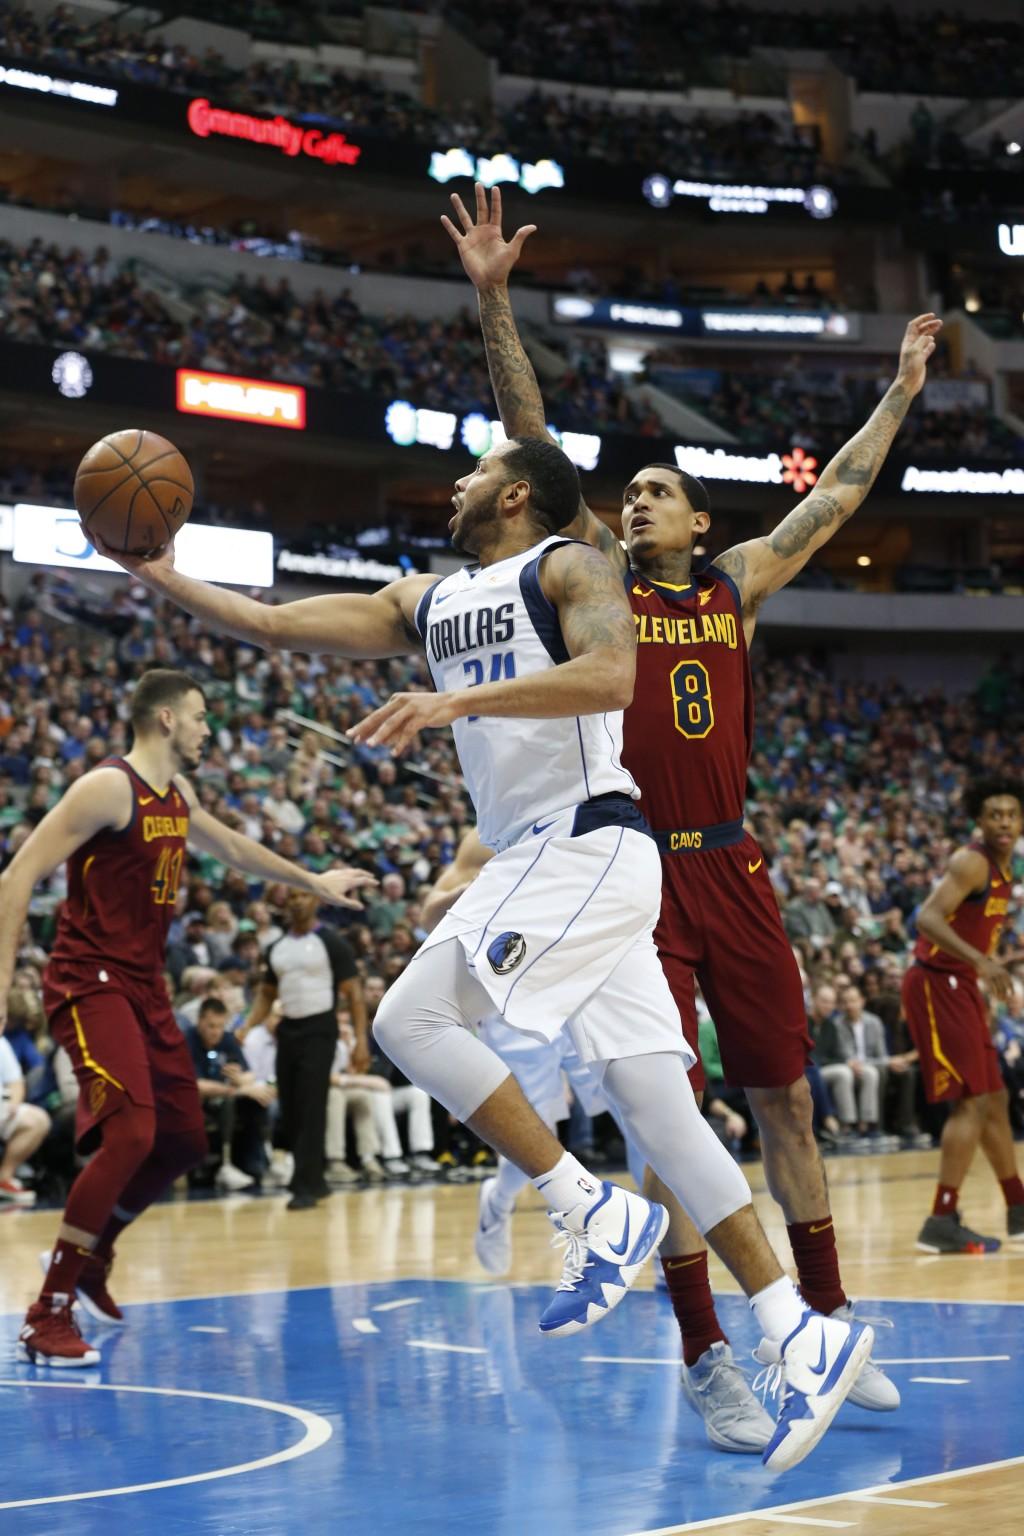 Dallas Mavericks guard Devin Harris (34) makes a layup next to Cleveland Cavaliers guard Jordan Clarkson (8) during the first half of an NBA basketbal